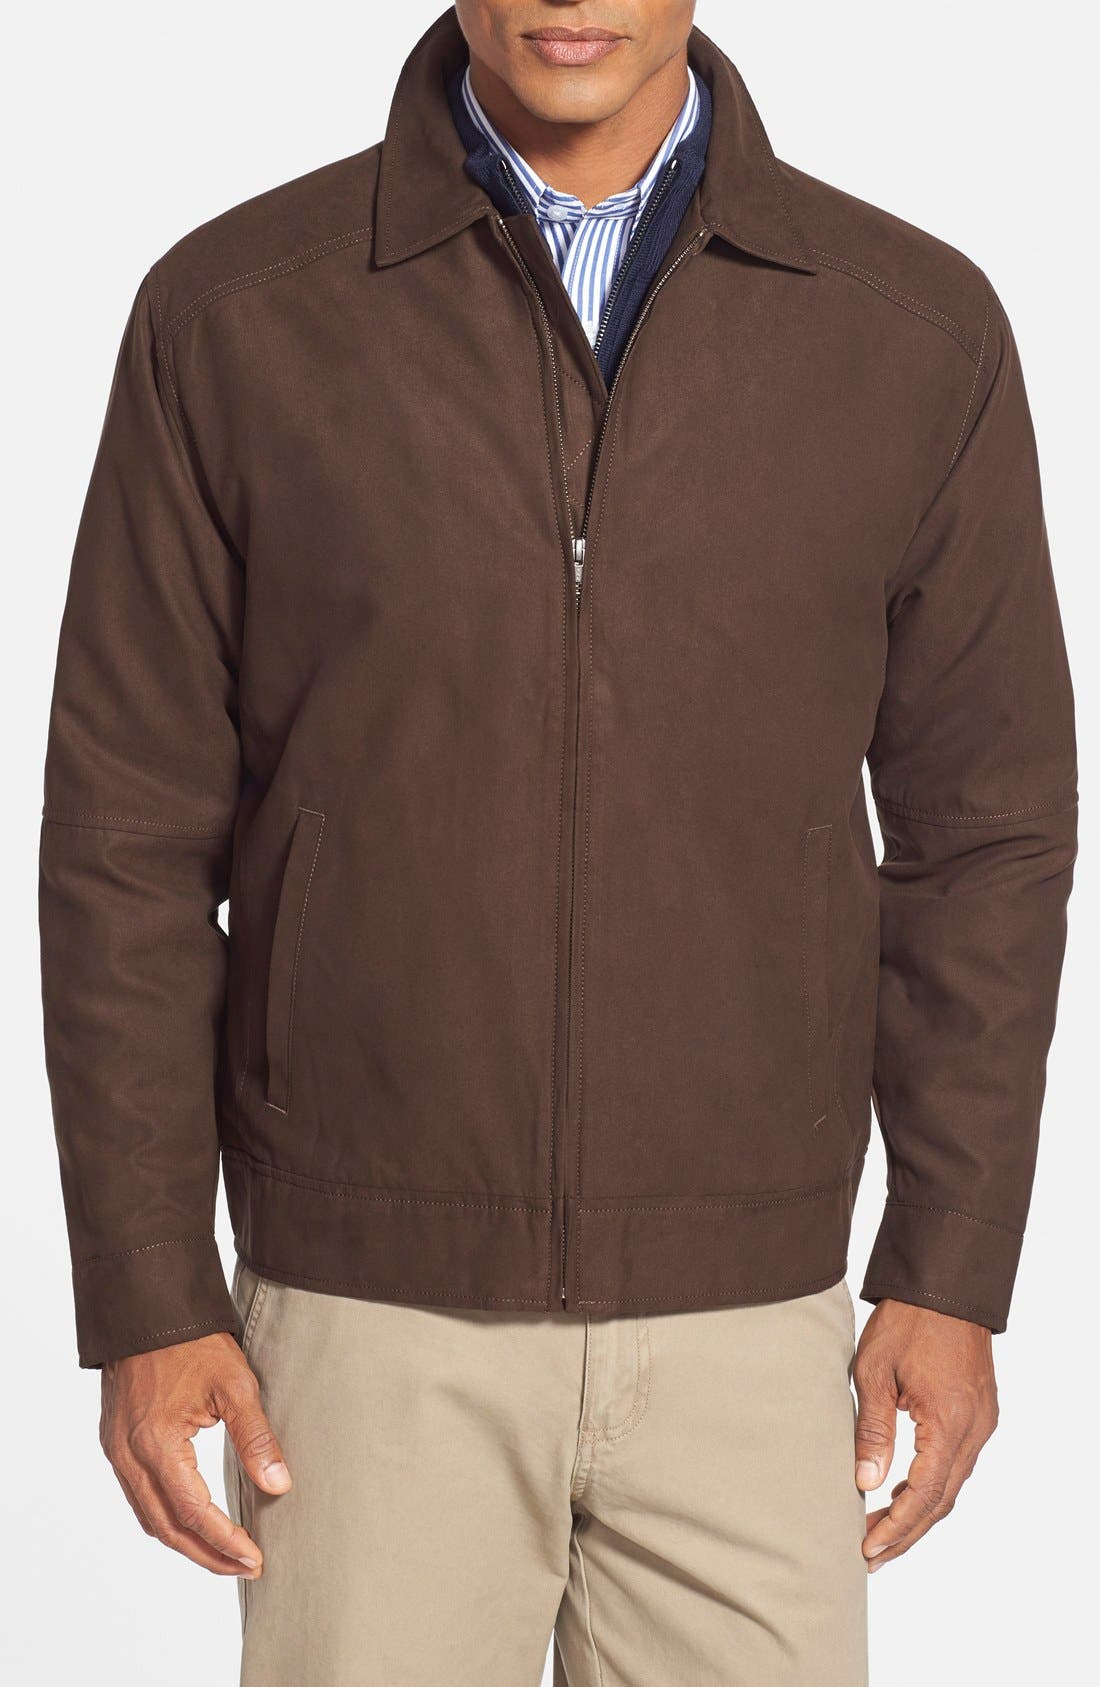 'Roosevelt' Classic Fit Water Resistant Full Zip Jacket,                         Main,                         color, BITTERSWEET BROWN